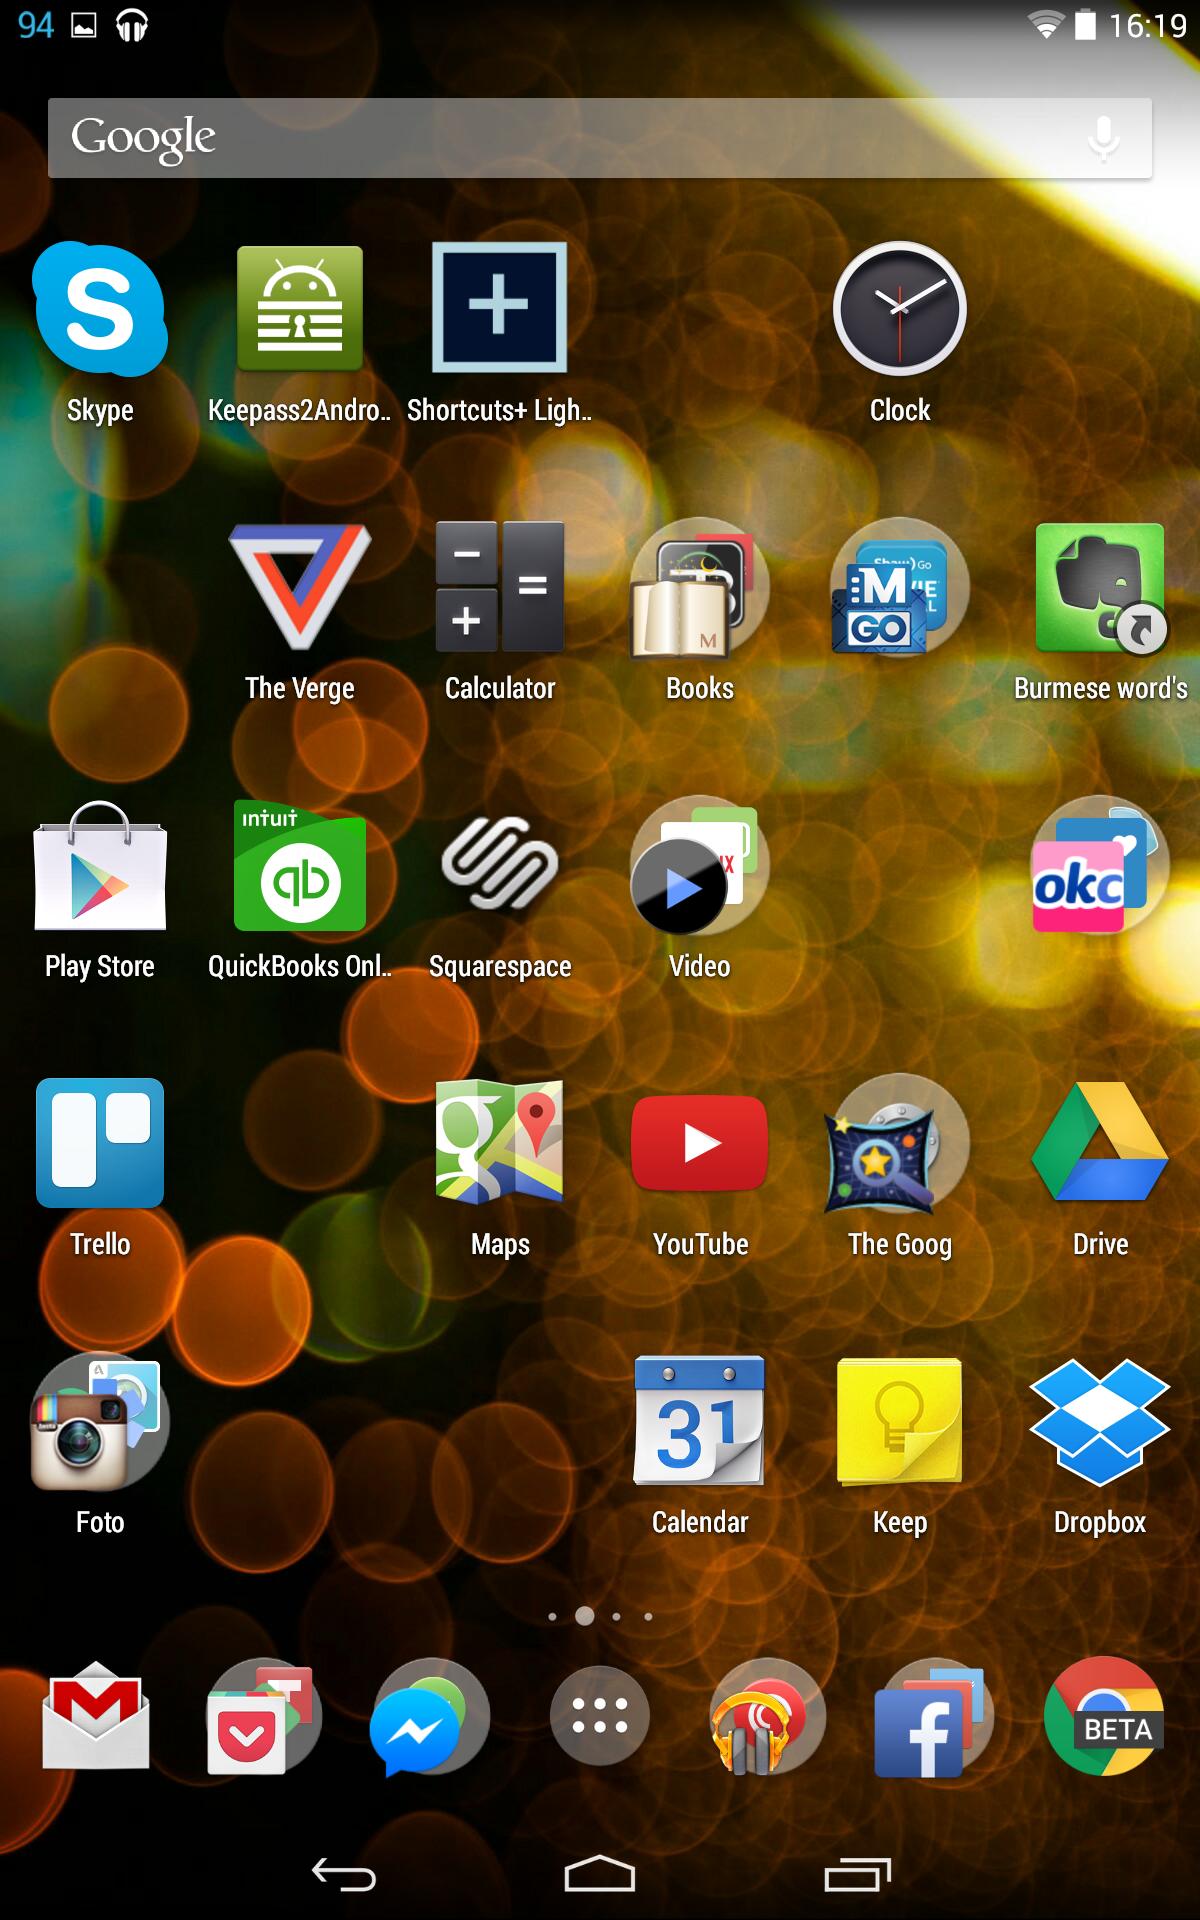 Screenshot_2014-08-27-16-19-03.png